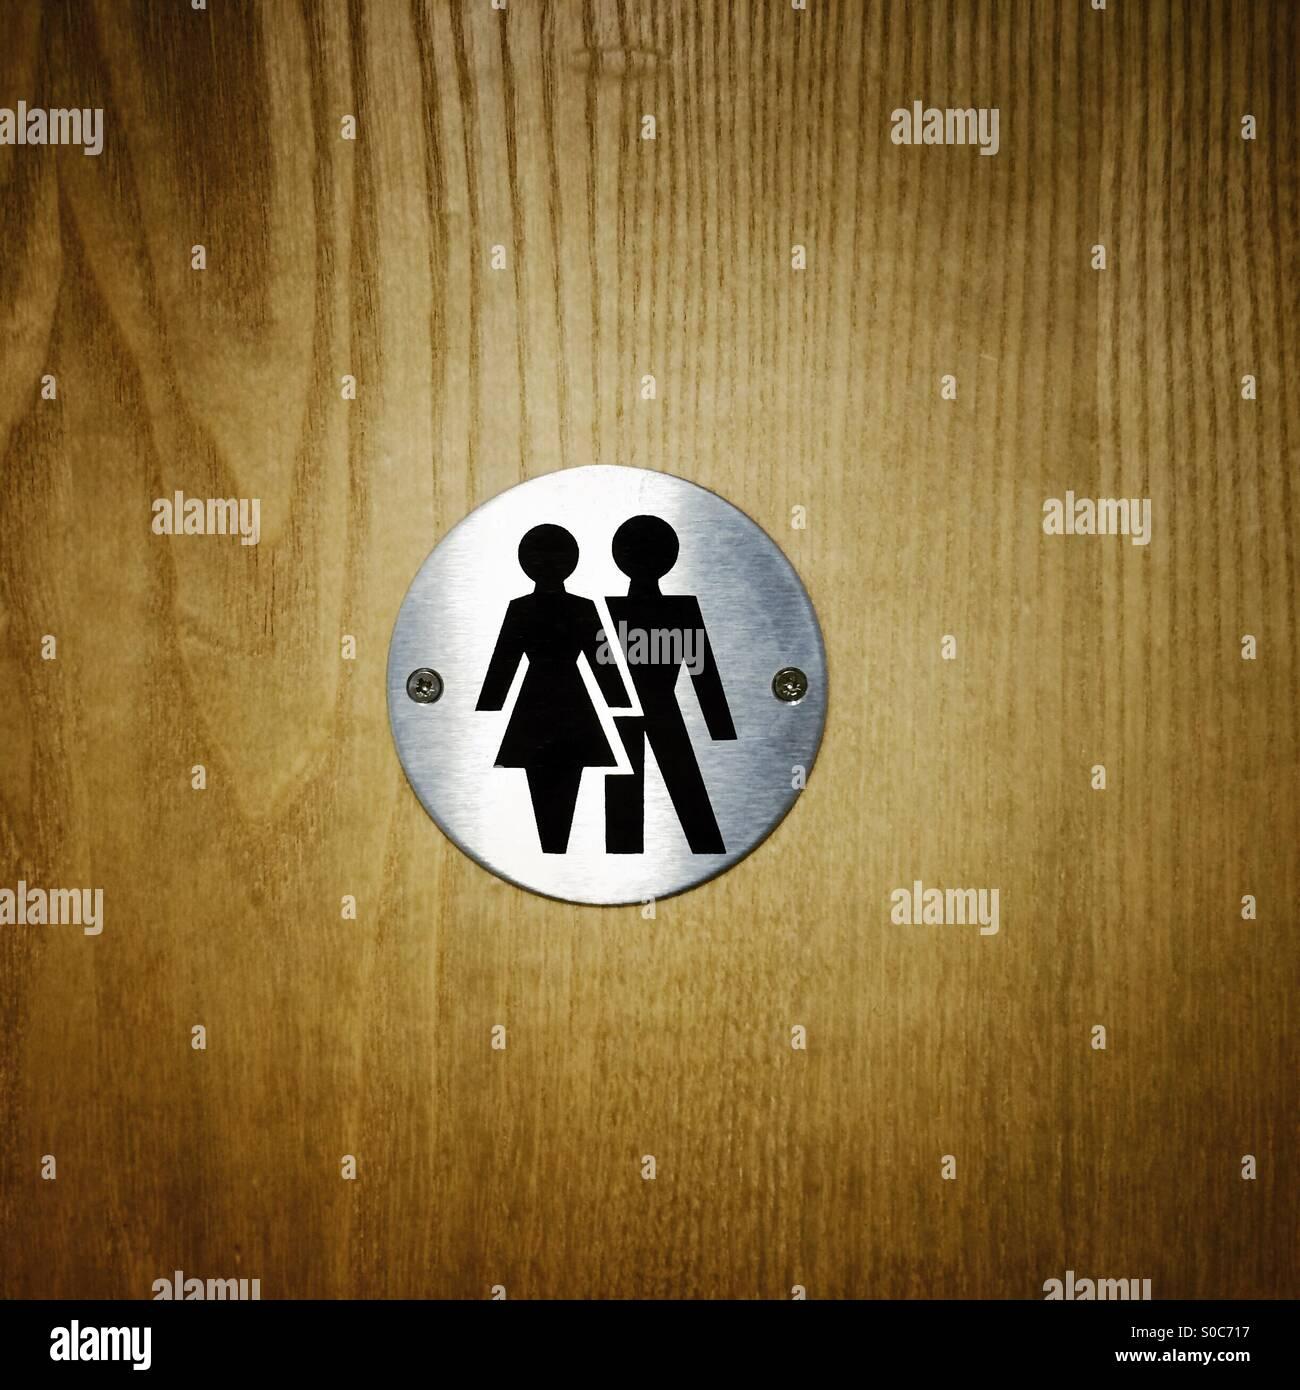 Male female men women couple unisex sign on wooden toilet wc door - Stock Image